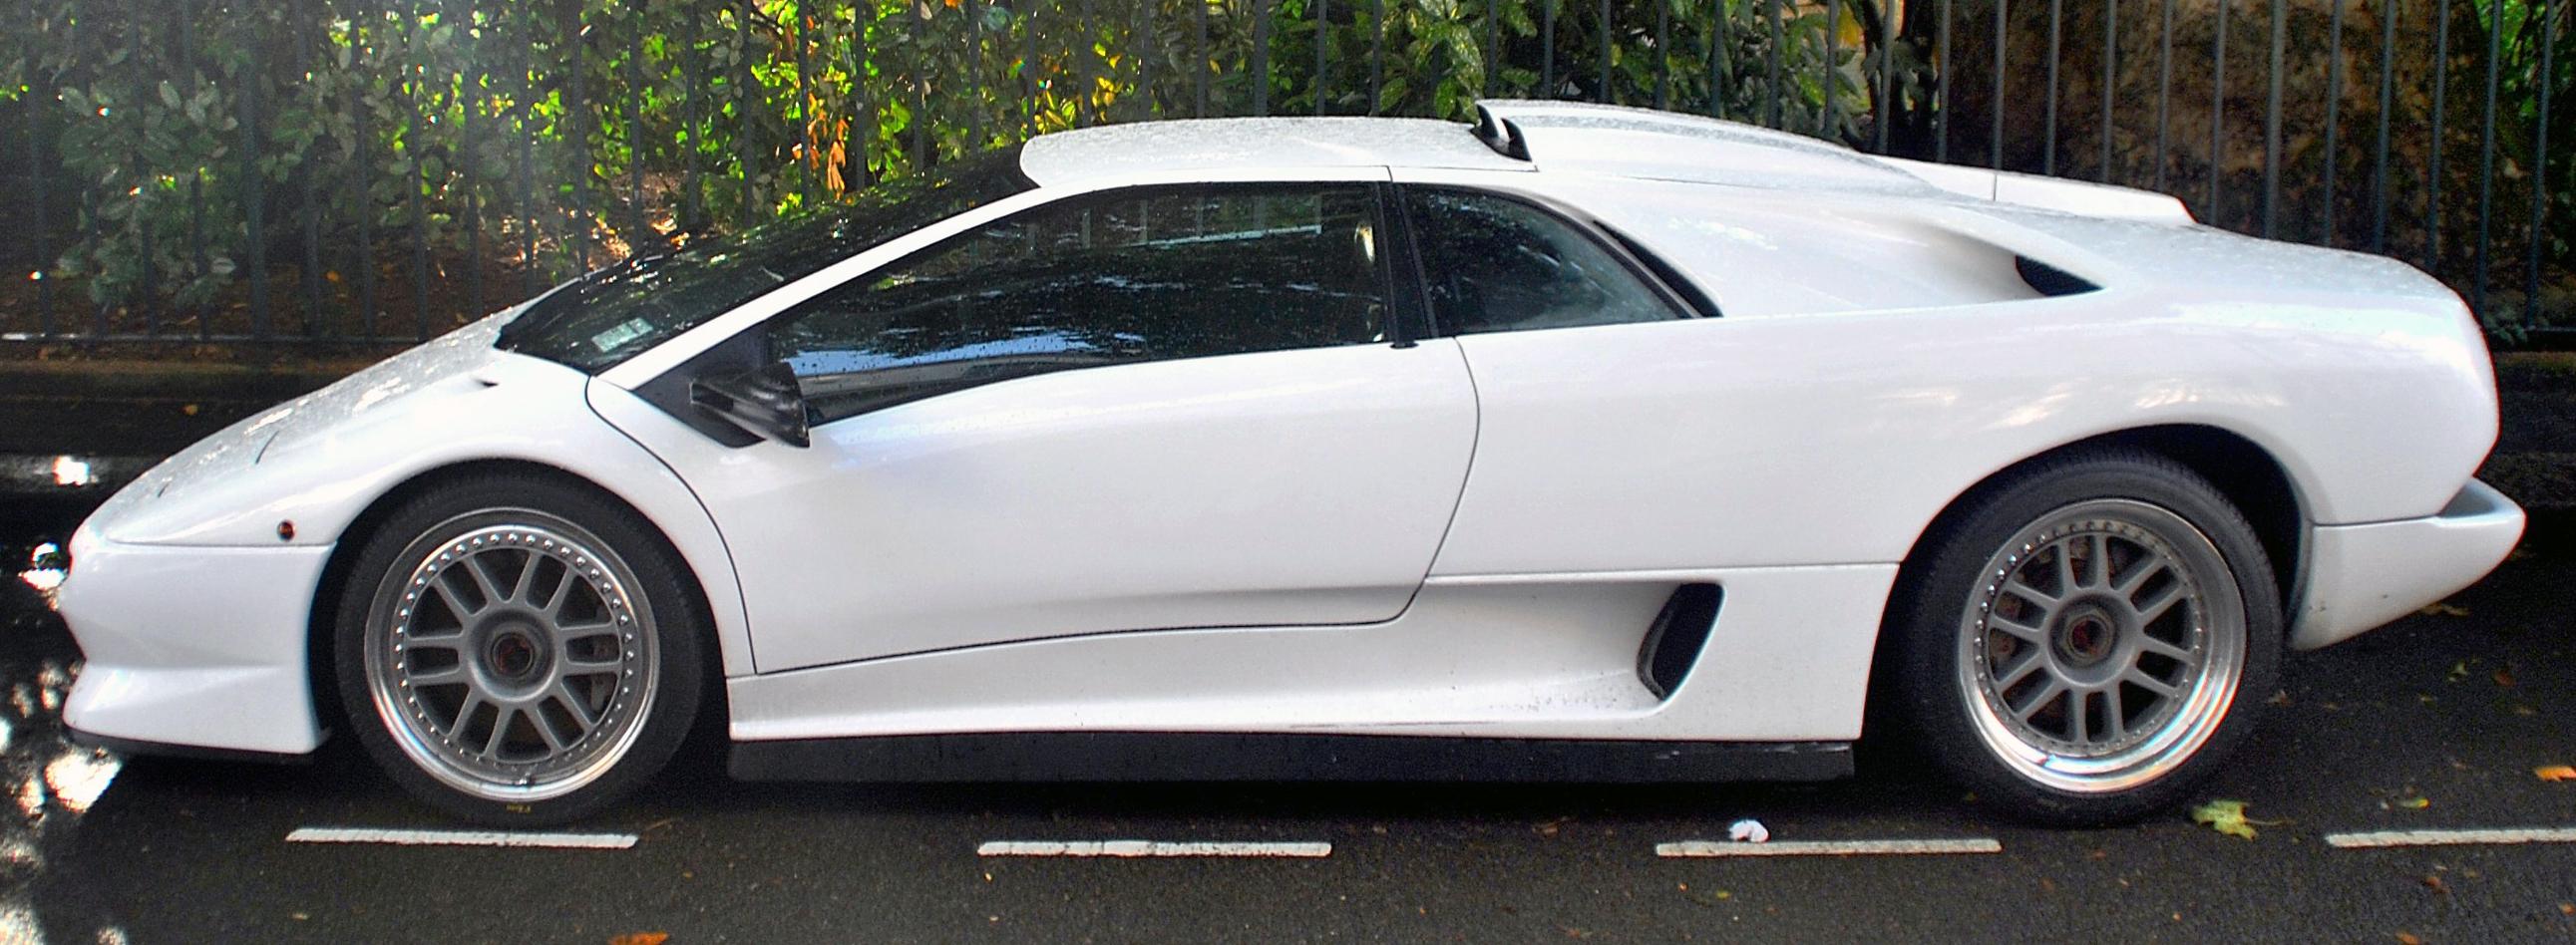 File Lamborghini Diablo Sv R Side Jpg Wikimedia Commons